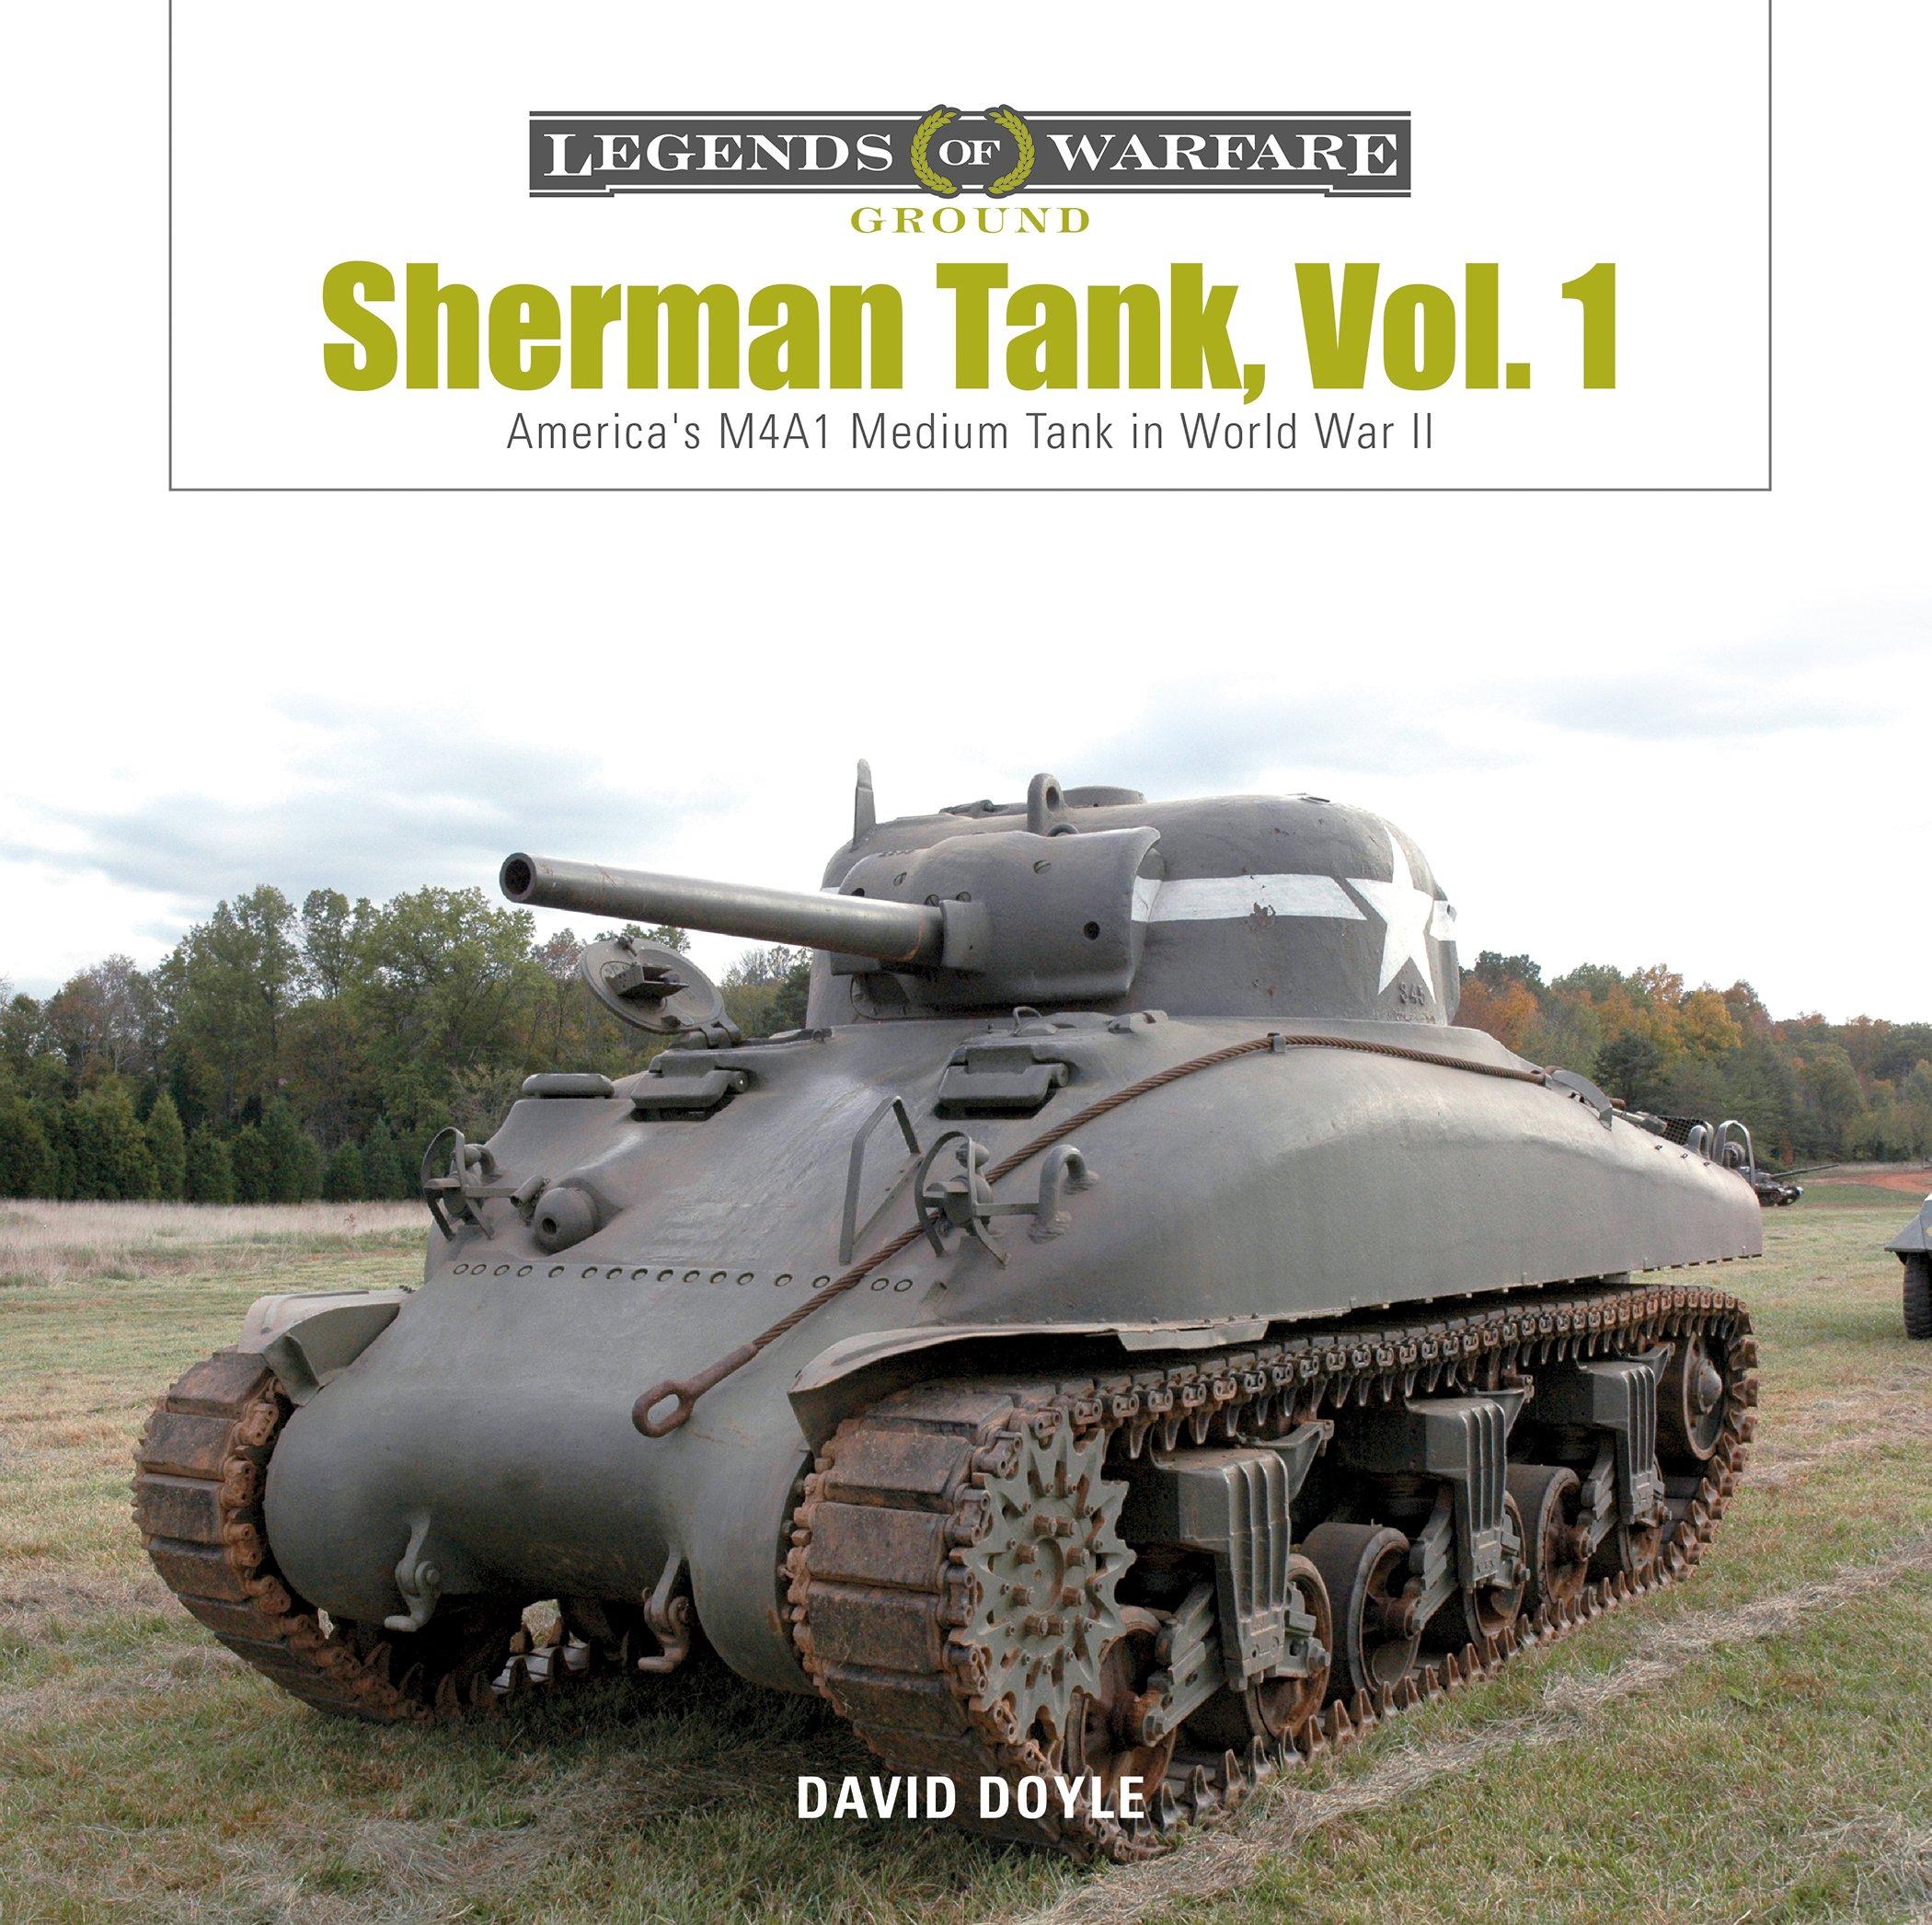 Amazon Com Sherman Tank Vol 1 America S M4a1 Medium Tank In World War Ii Legends Of Warfare Ground 9780764355677 Doyle David Books